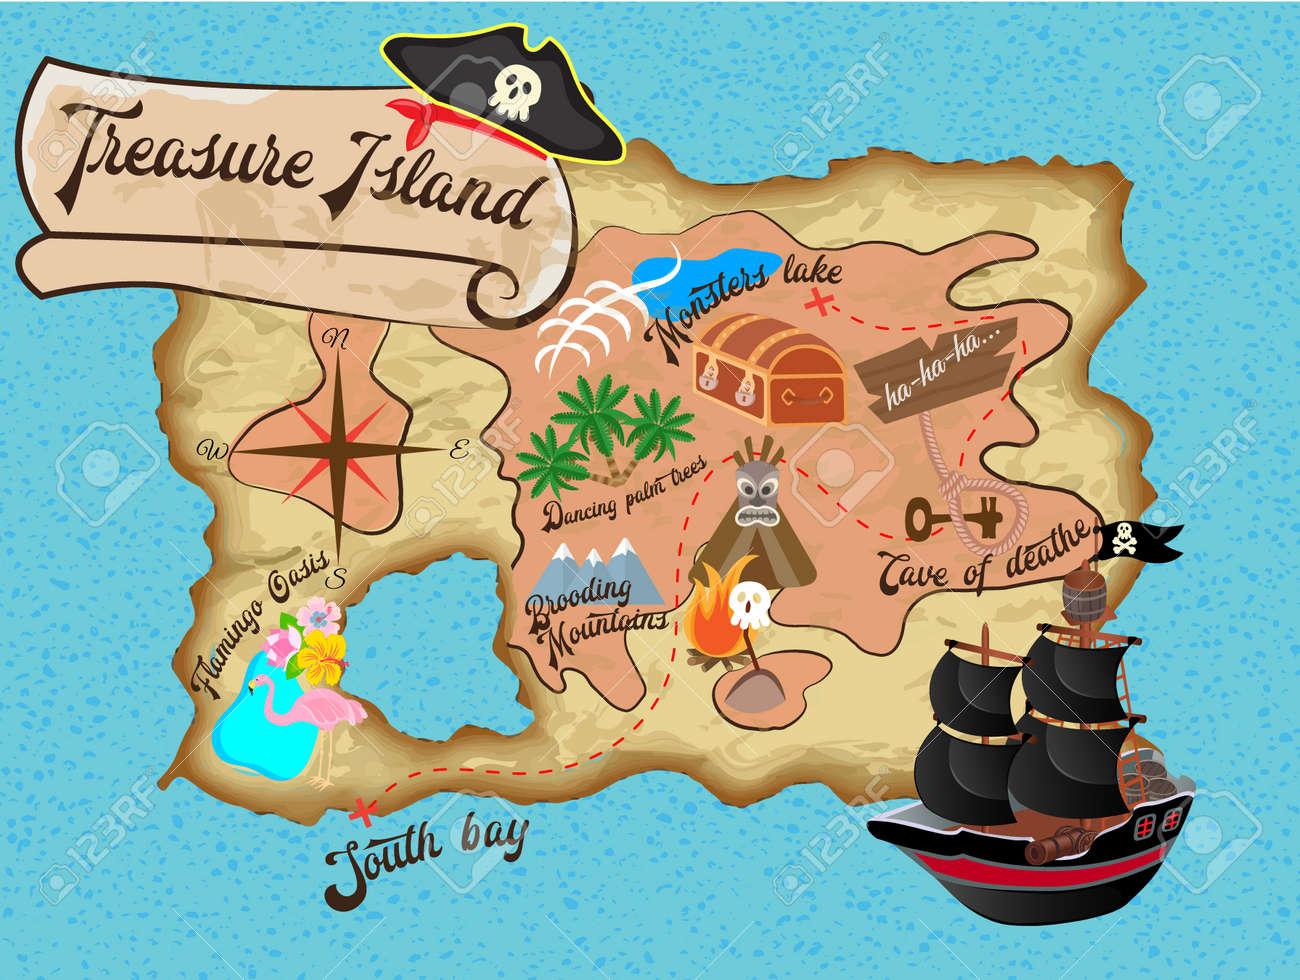 Mapa Isla Del Tesoro.Mapa De La Isla Del Tesoro Para La Ilustracion Vectorial Pirate Quest